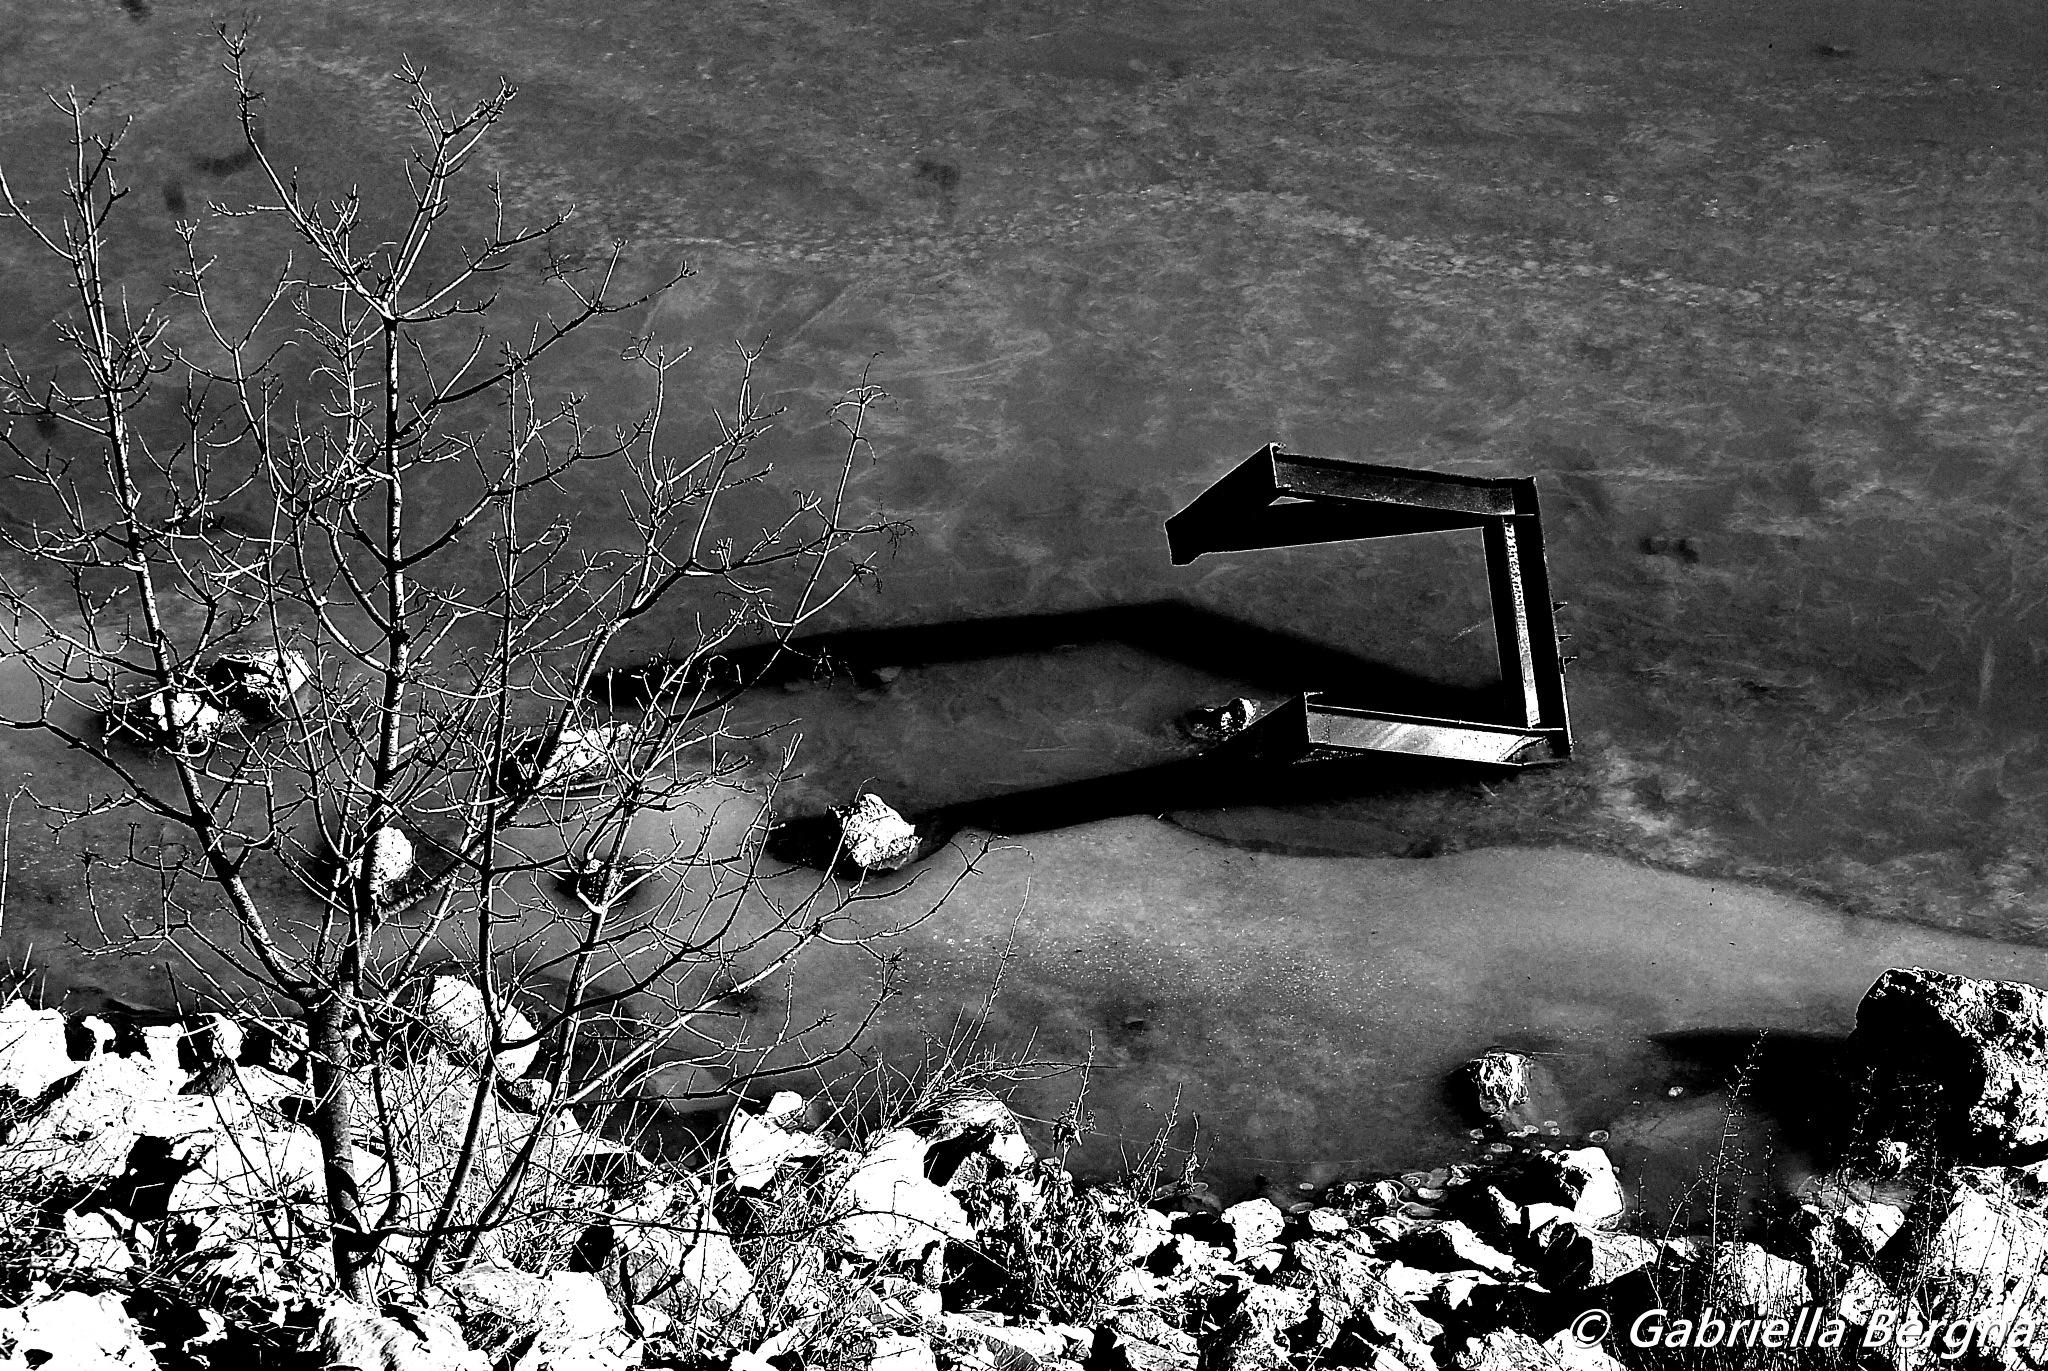 Musical Note Shadow by Gabriella Bergna